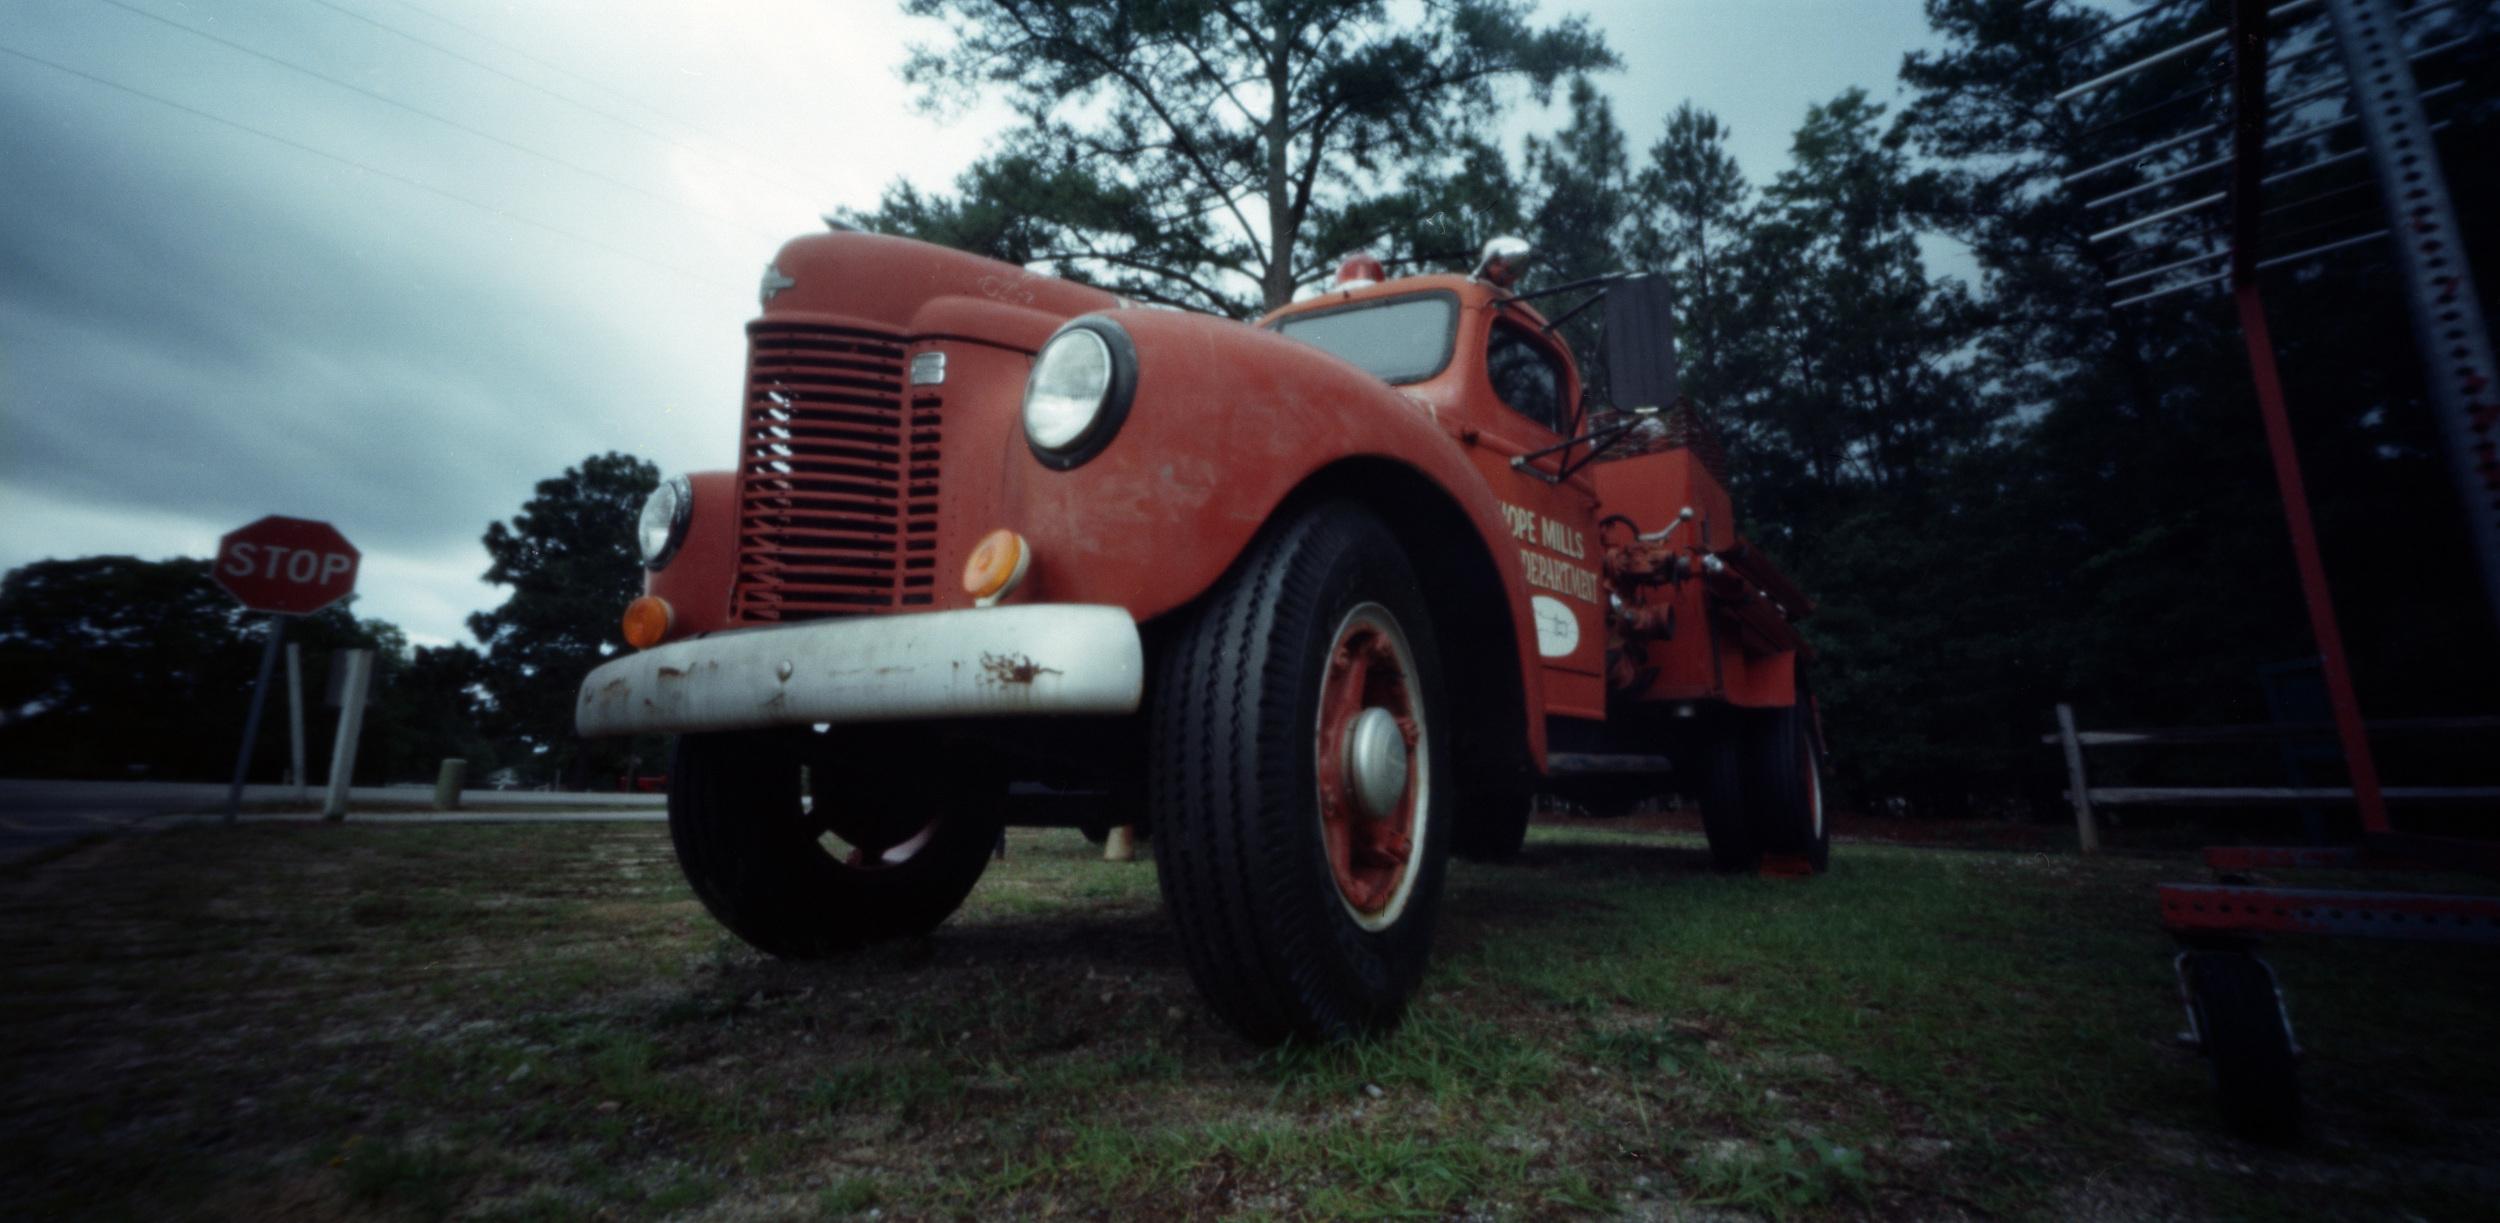 Old Fire Truck | Holga 120 WPC | Lomo 100 | Bobby Kulik